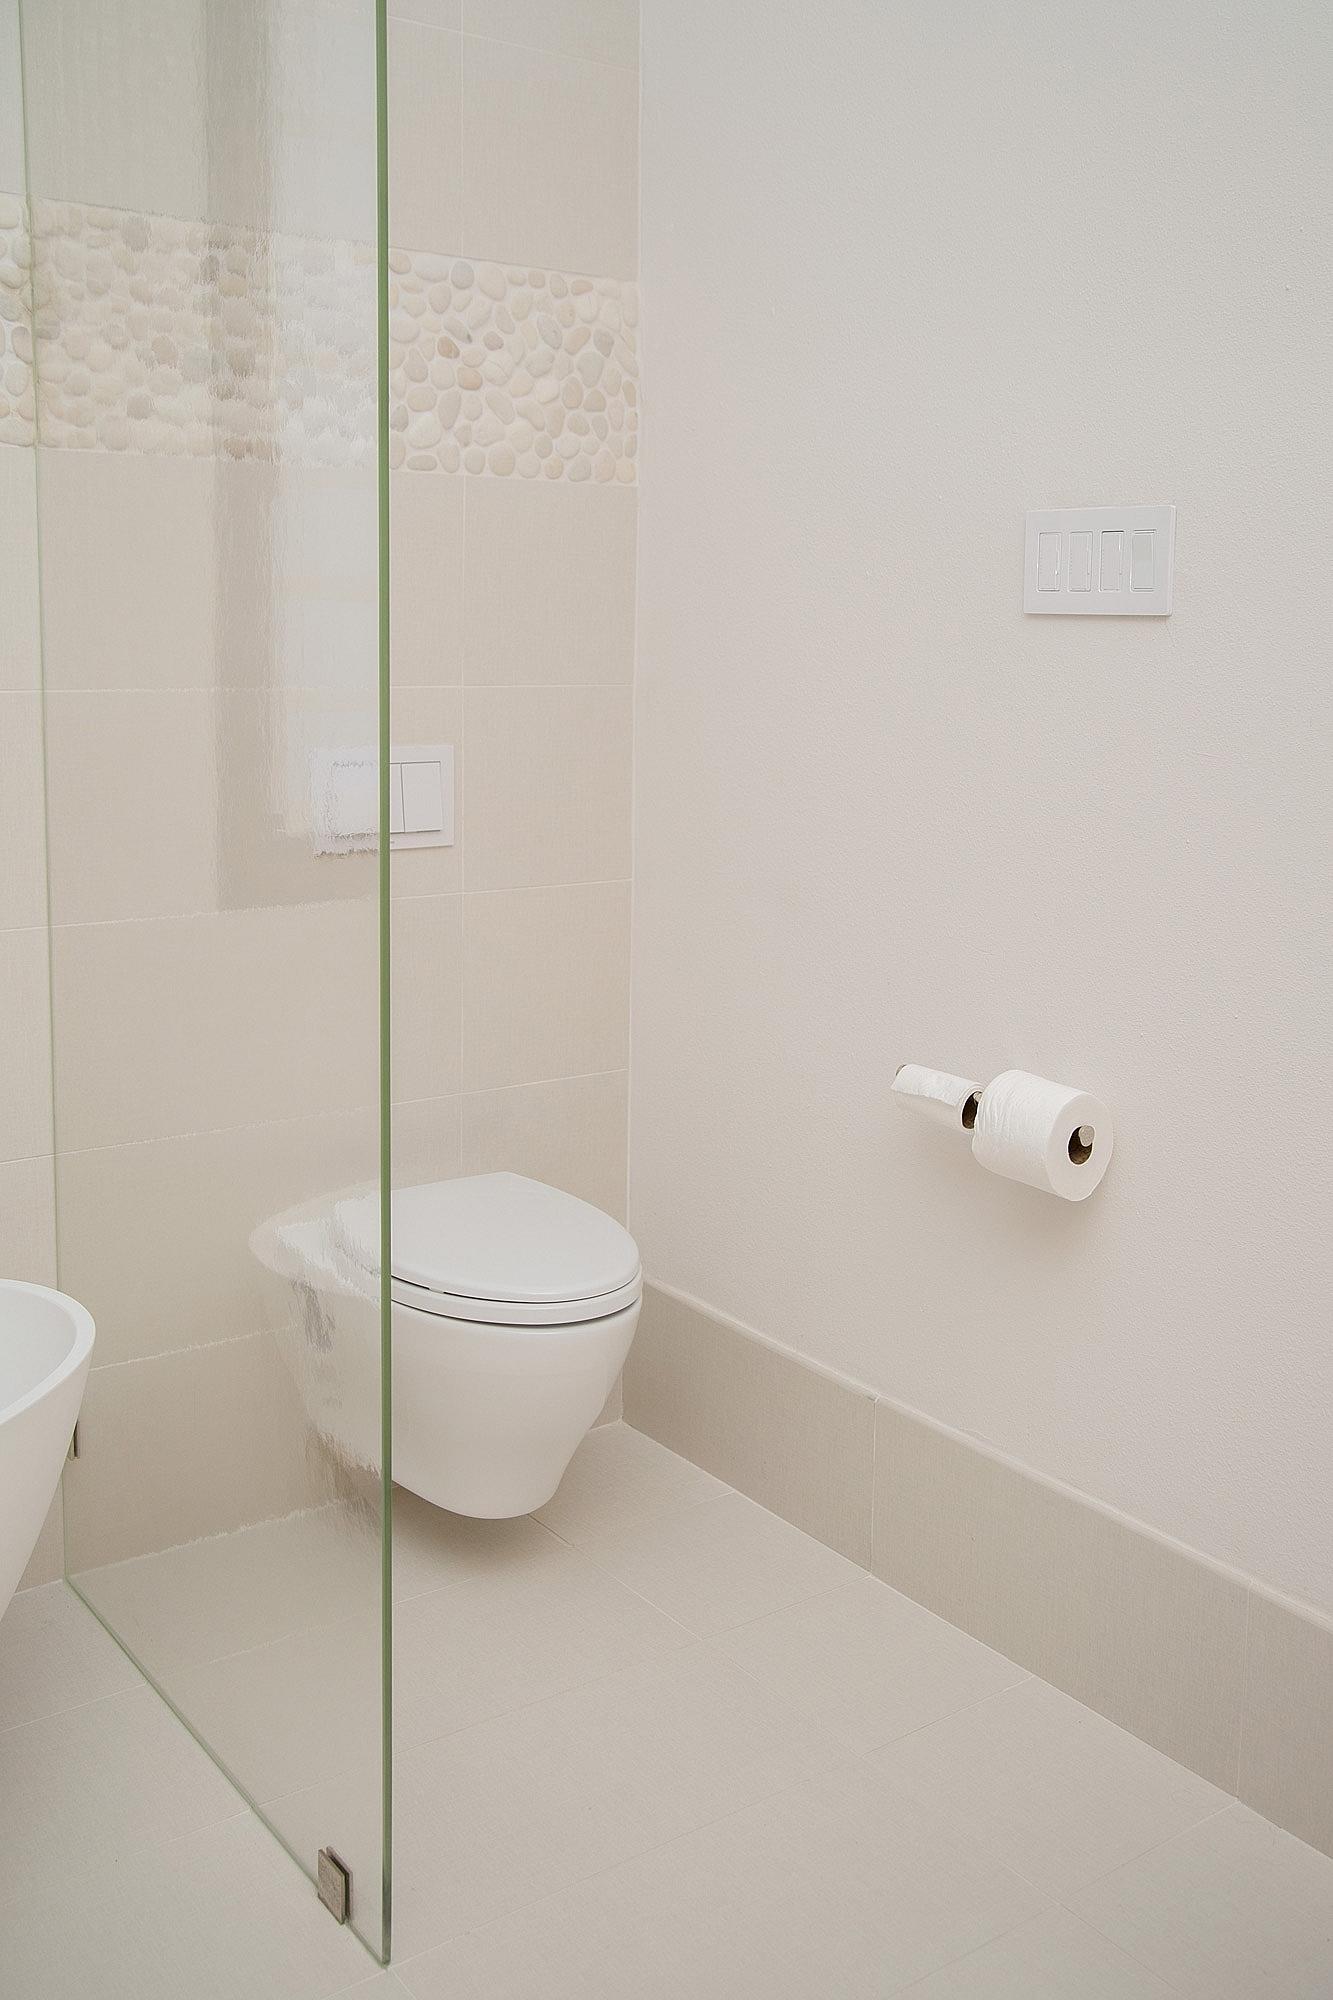 Master bathroom remodel with wall mounted Toto toilet | Interior Designer: Carla Aston / Photographer: Tori Aston #bathroomideas #bathroomremodel #tototoilet #wallmounttoilet